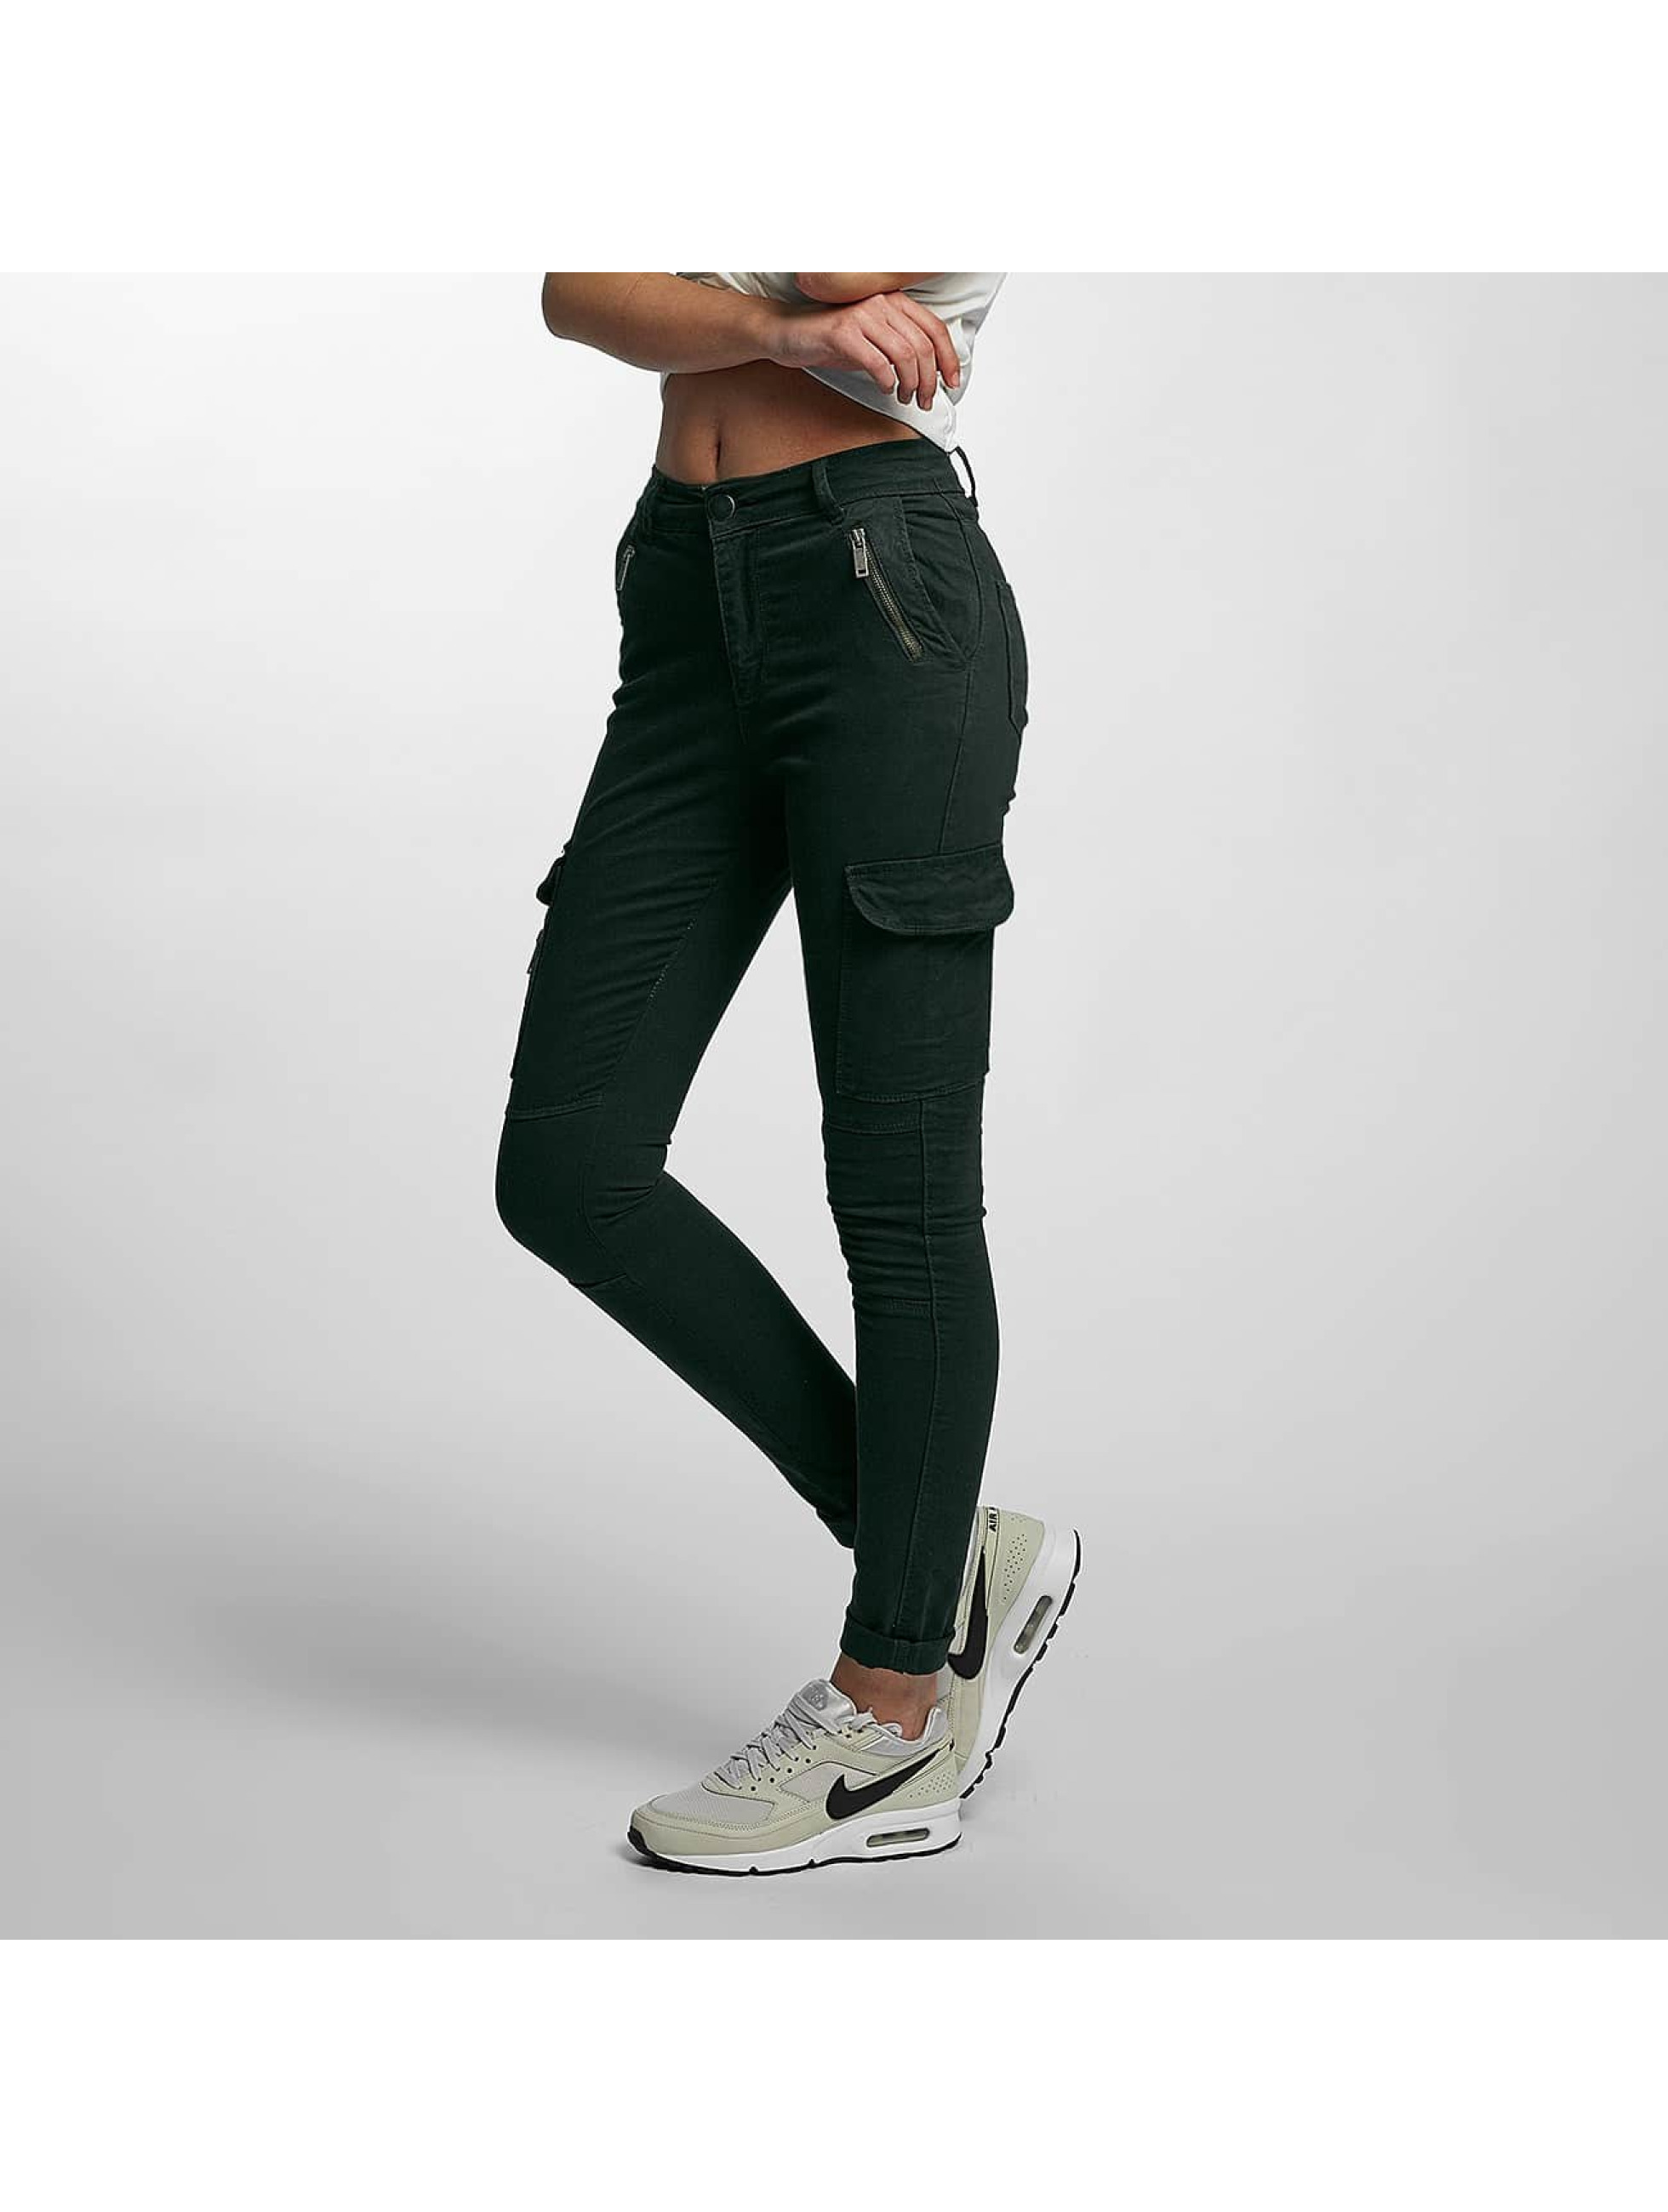 DEF-Donne-Jeans-Jeans-slim-fit-Luisa